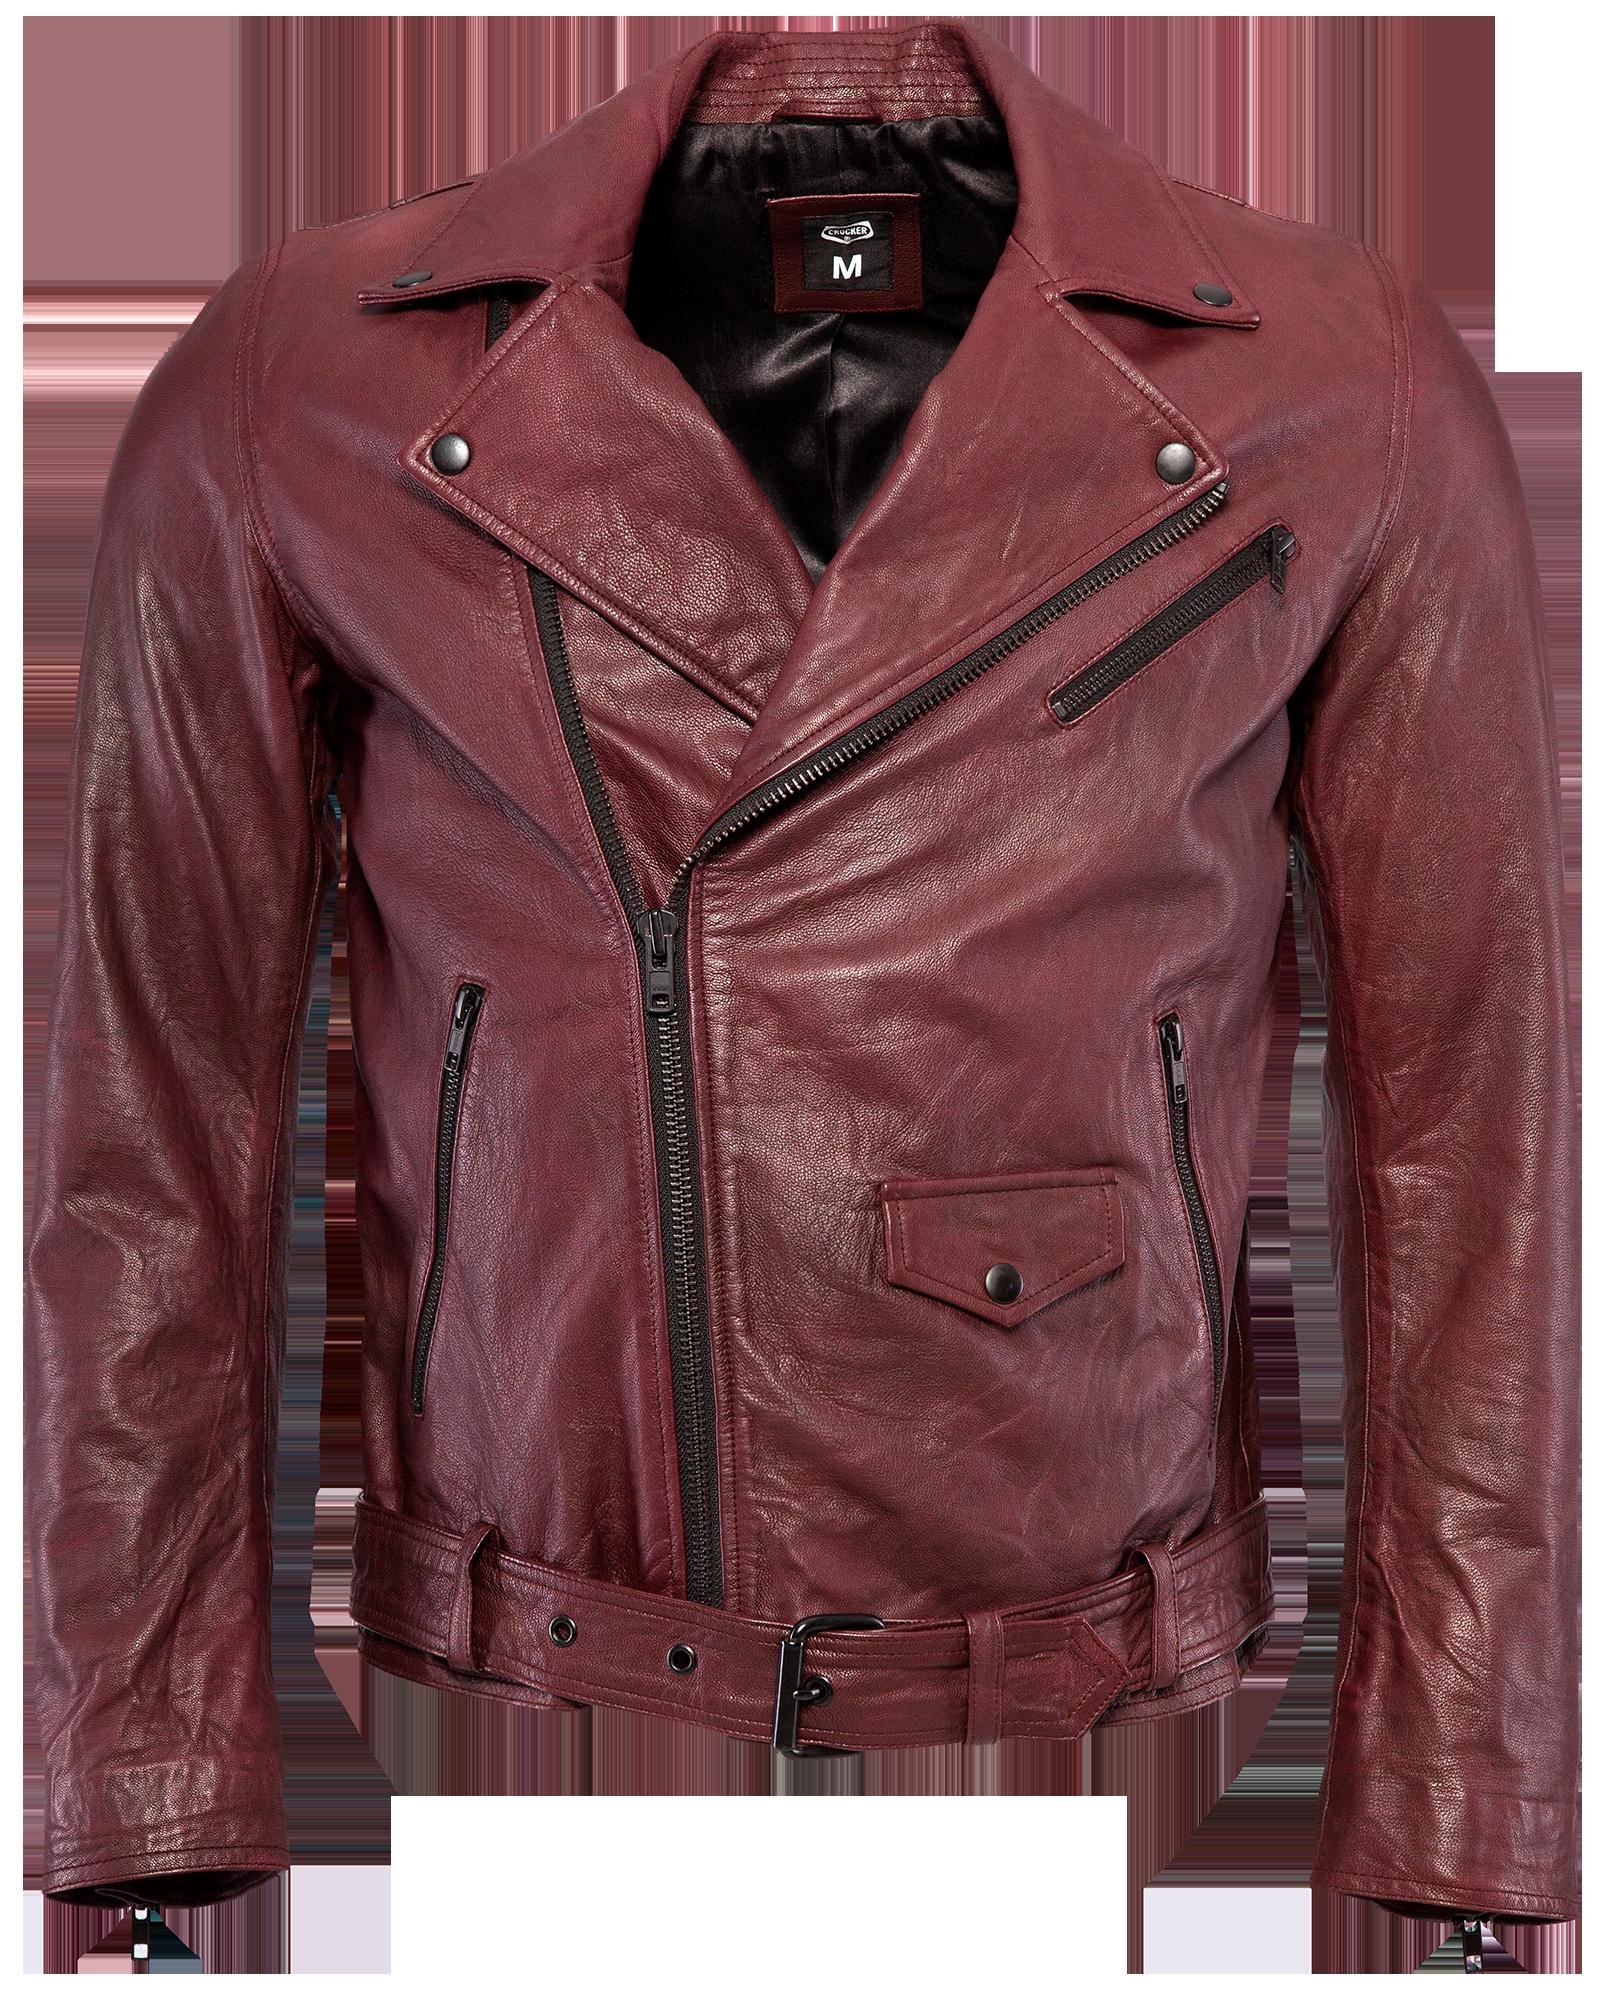 Jack Leather Oxblood Jacket